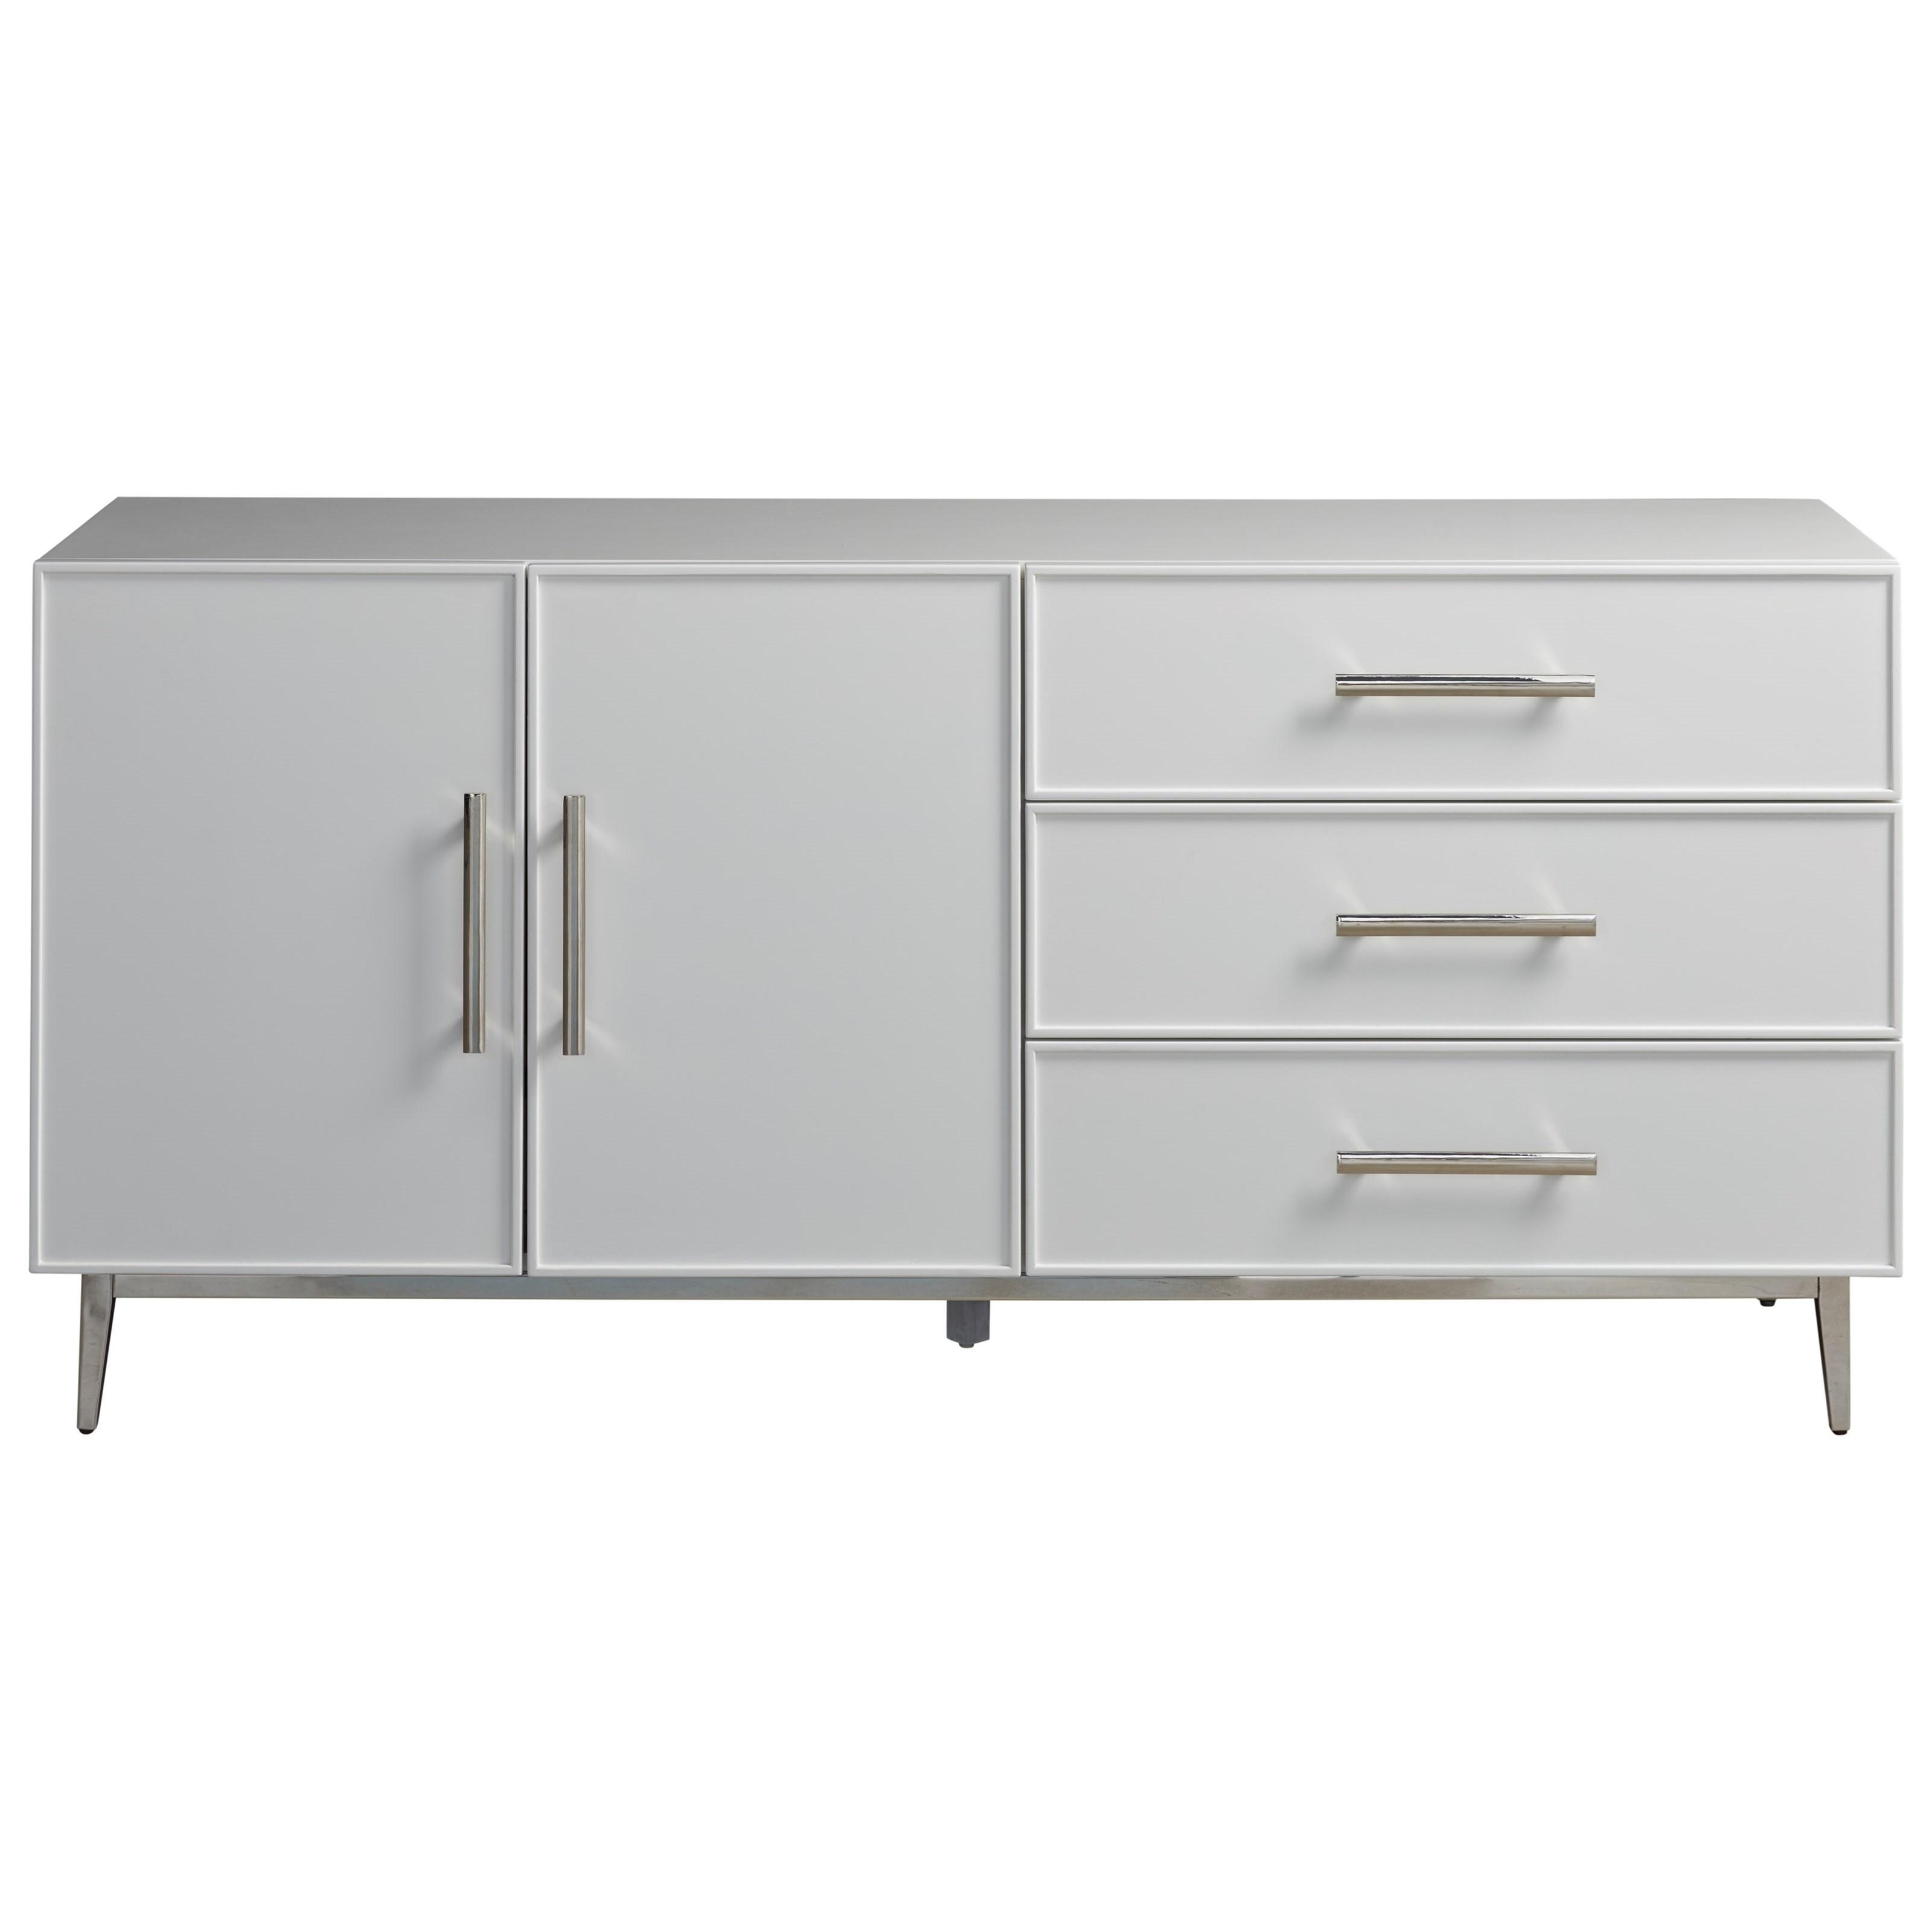 Modern Lane Dresser by Universal at Baer's Furniture